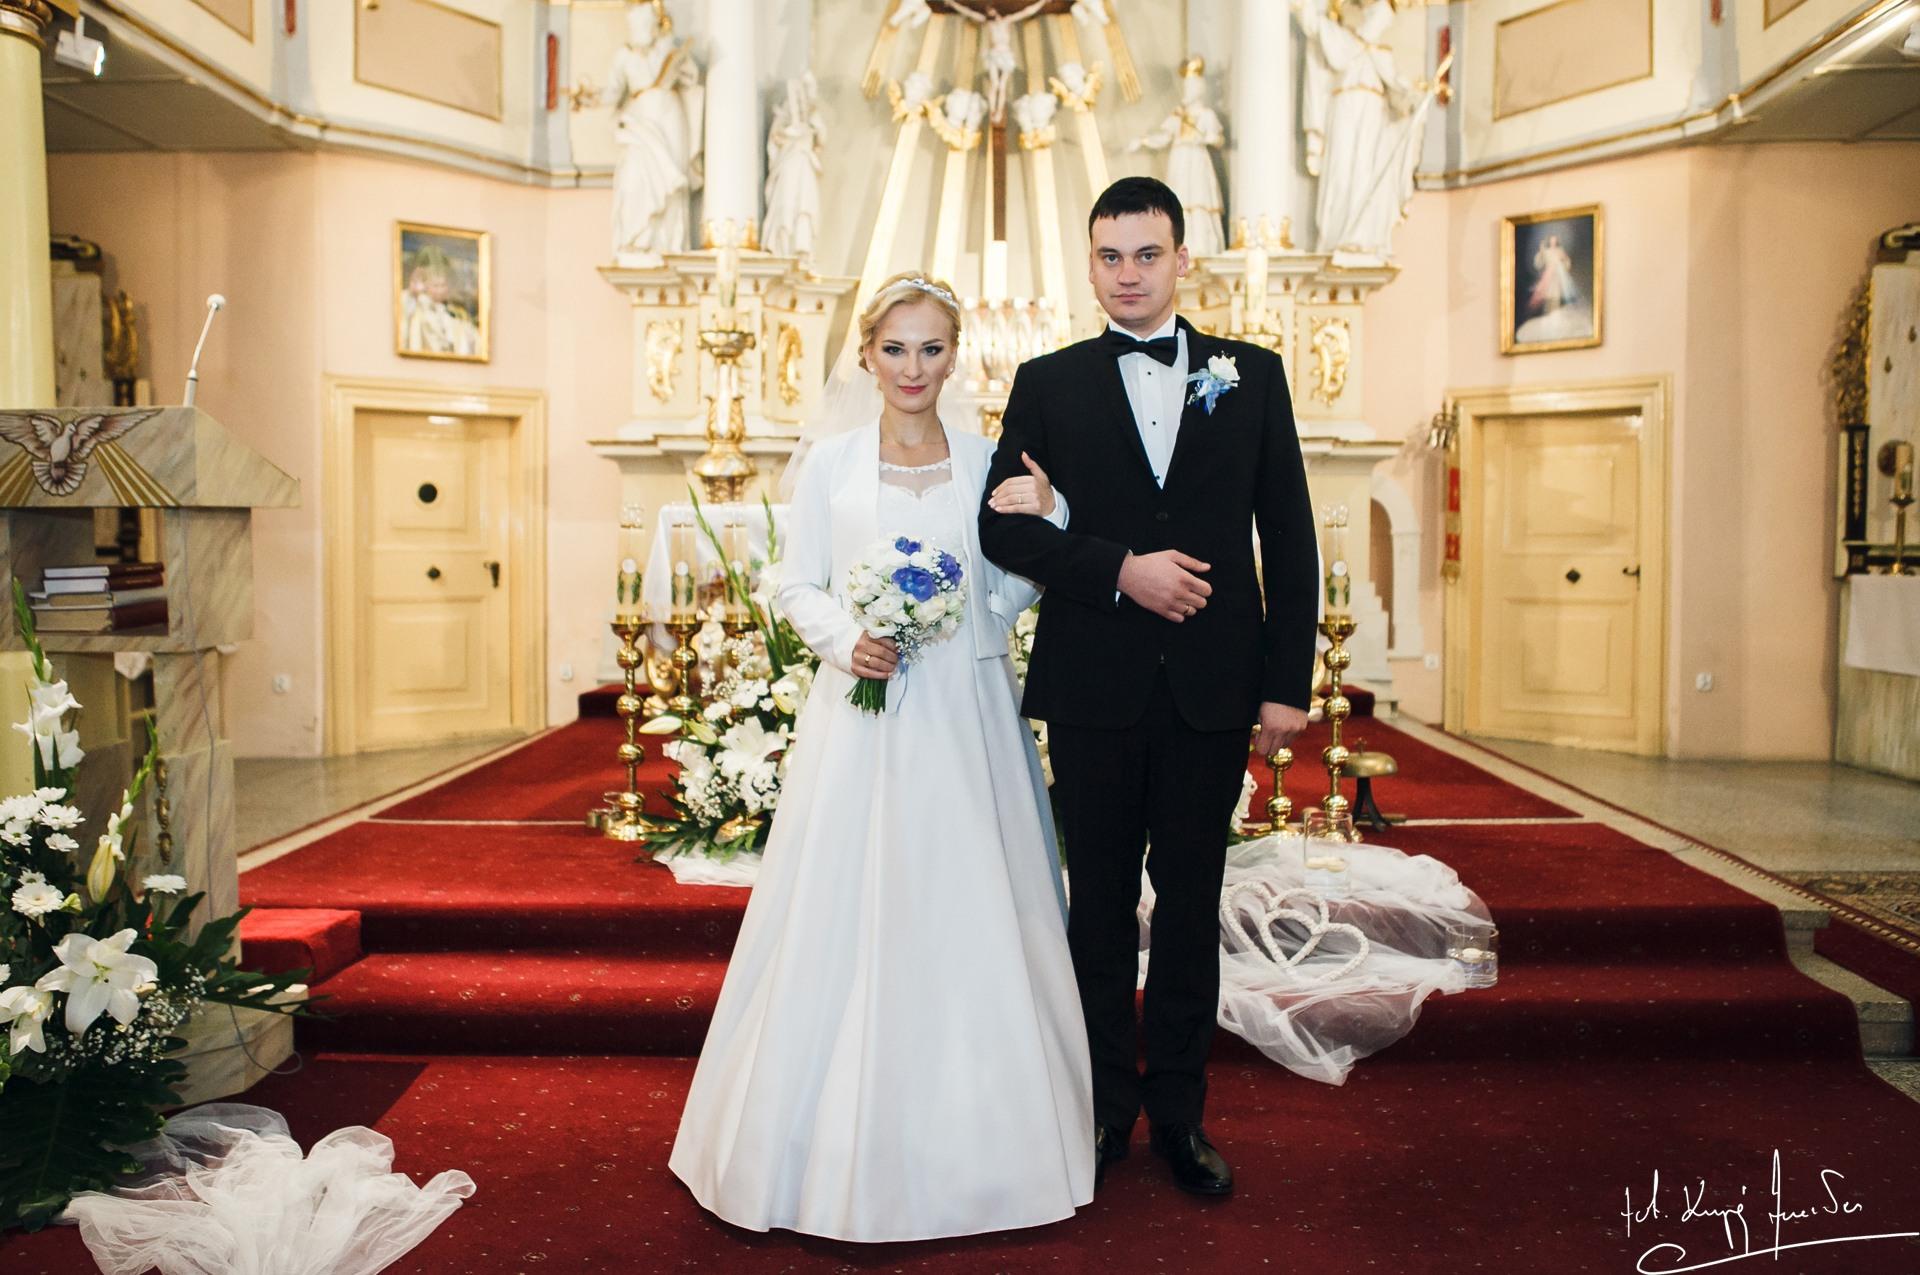 Jawor 61 Lidia & Piotr